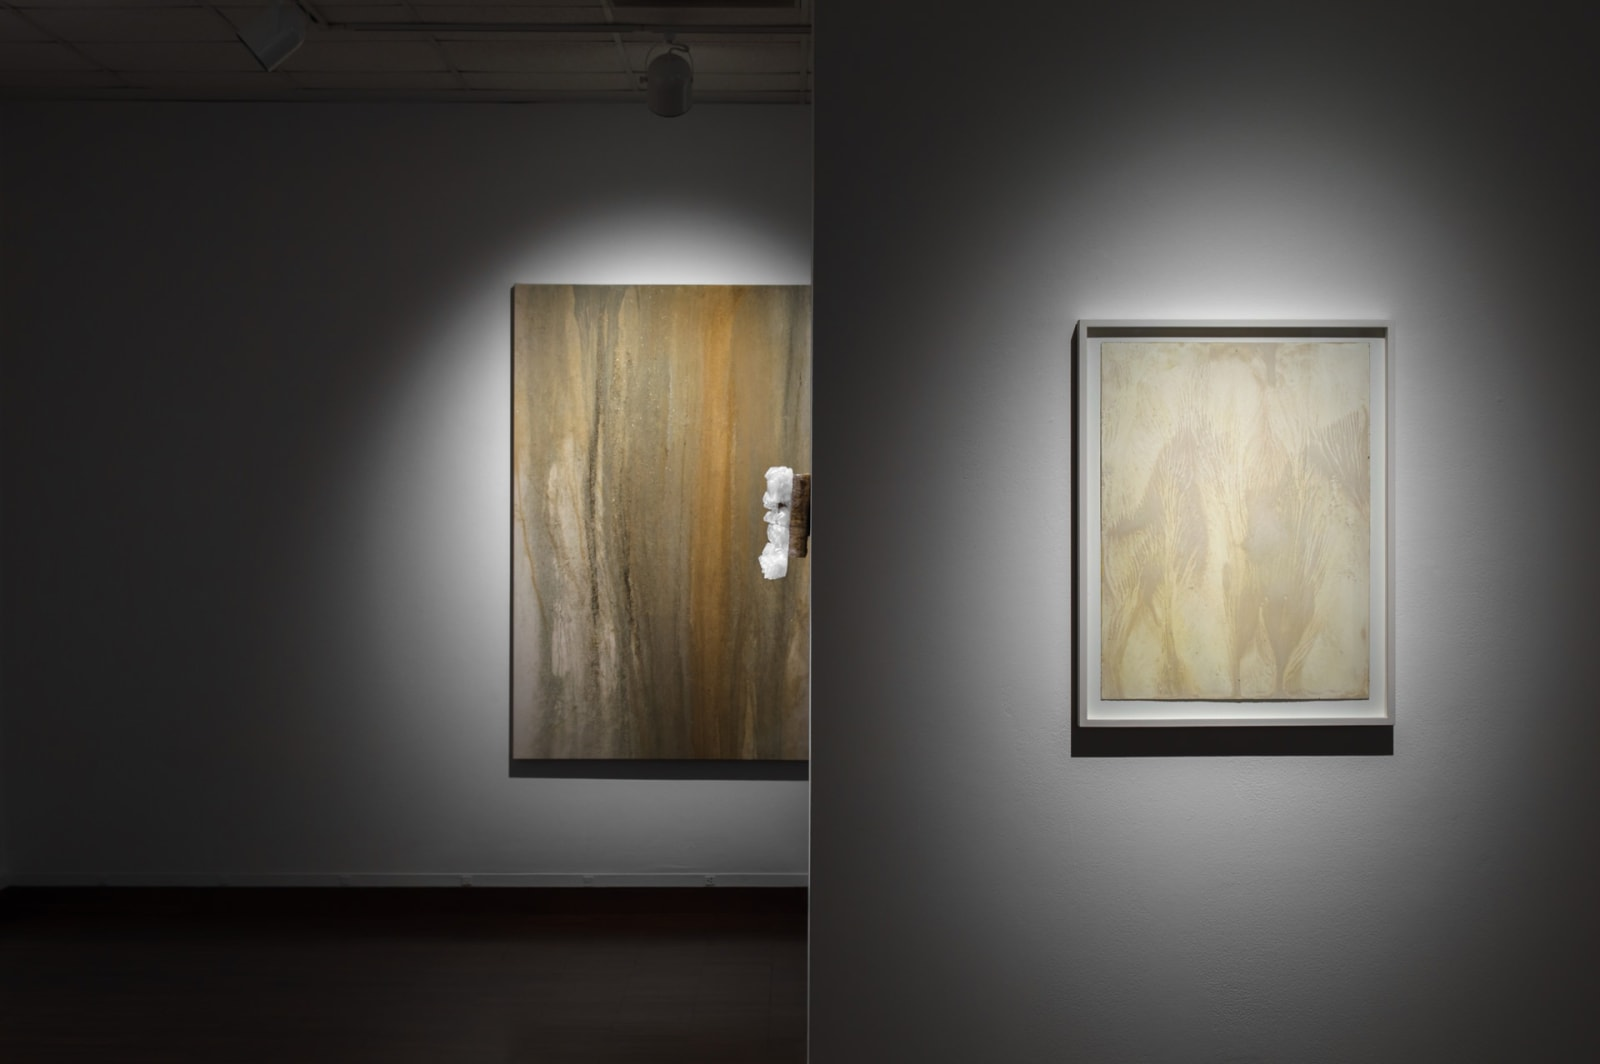 Shinji Turner-Yamamoto, Sidereal Silence: Irish Study #37, 2015